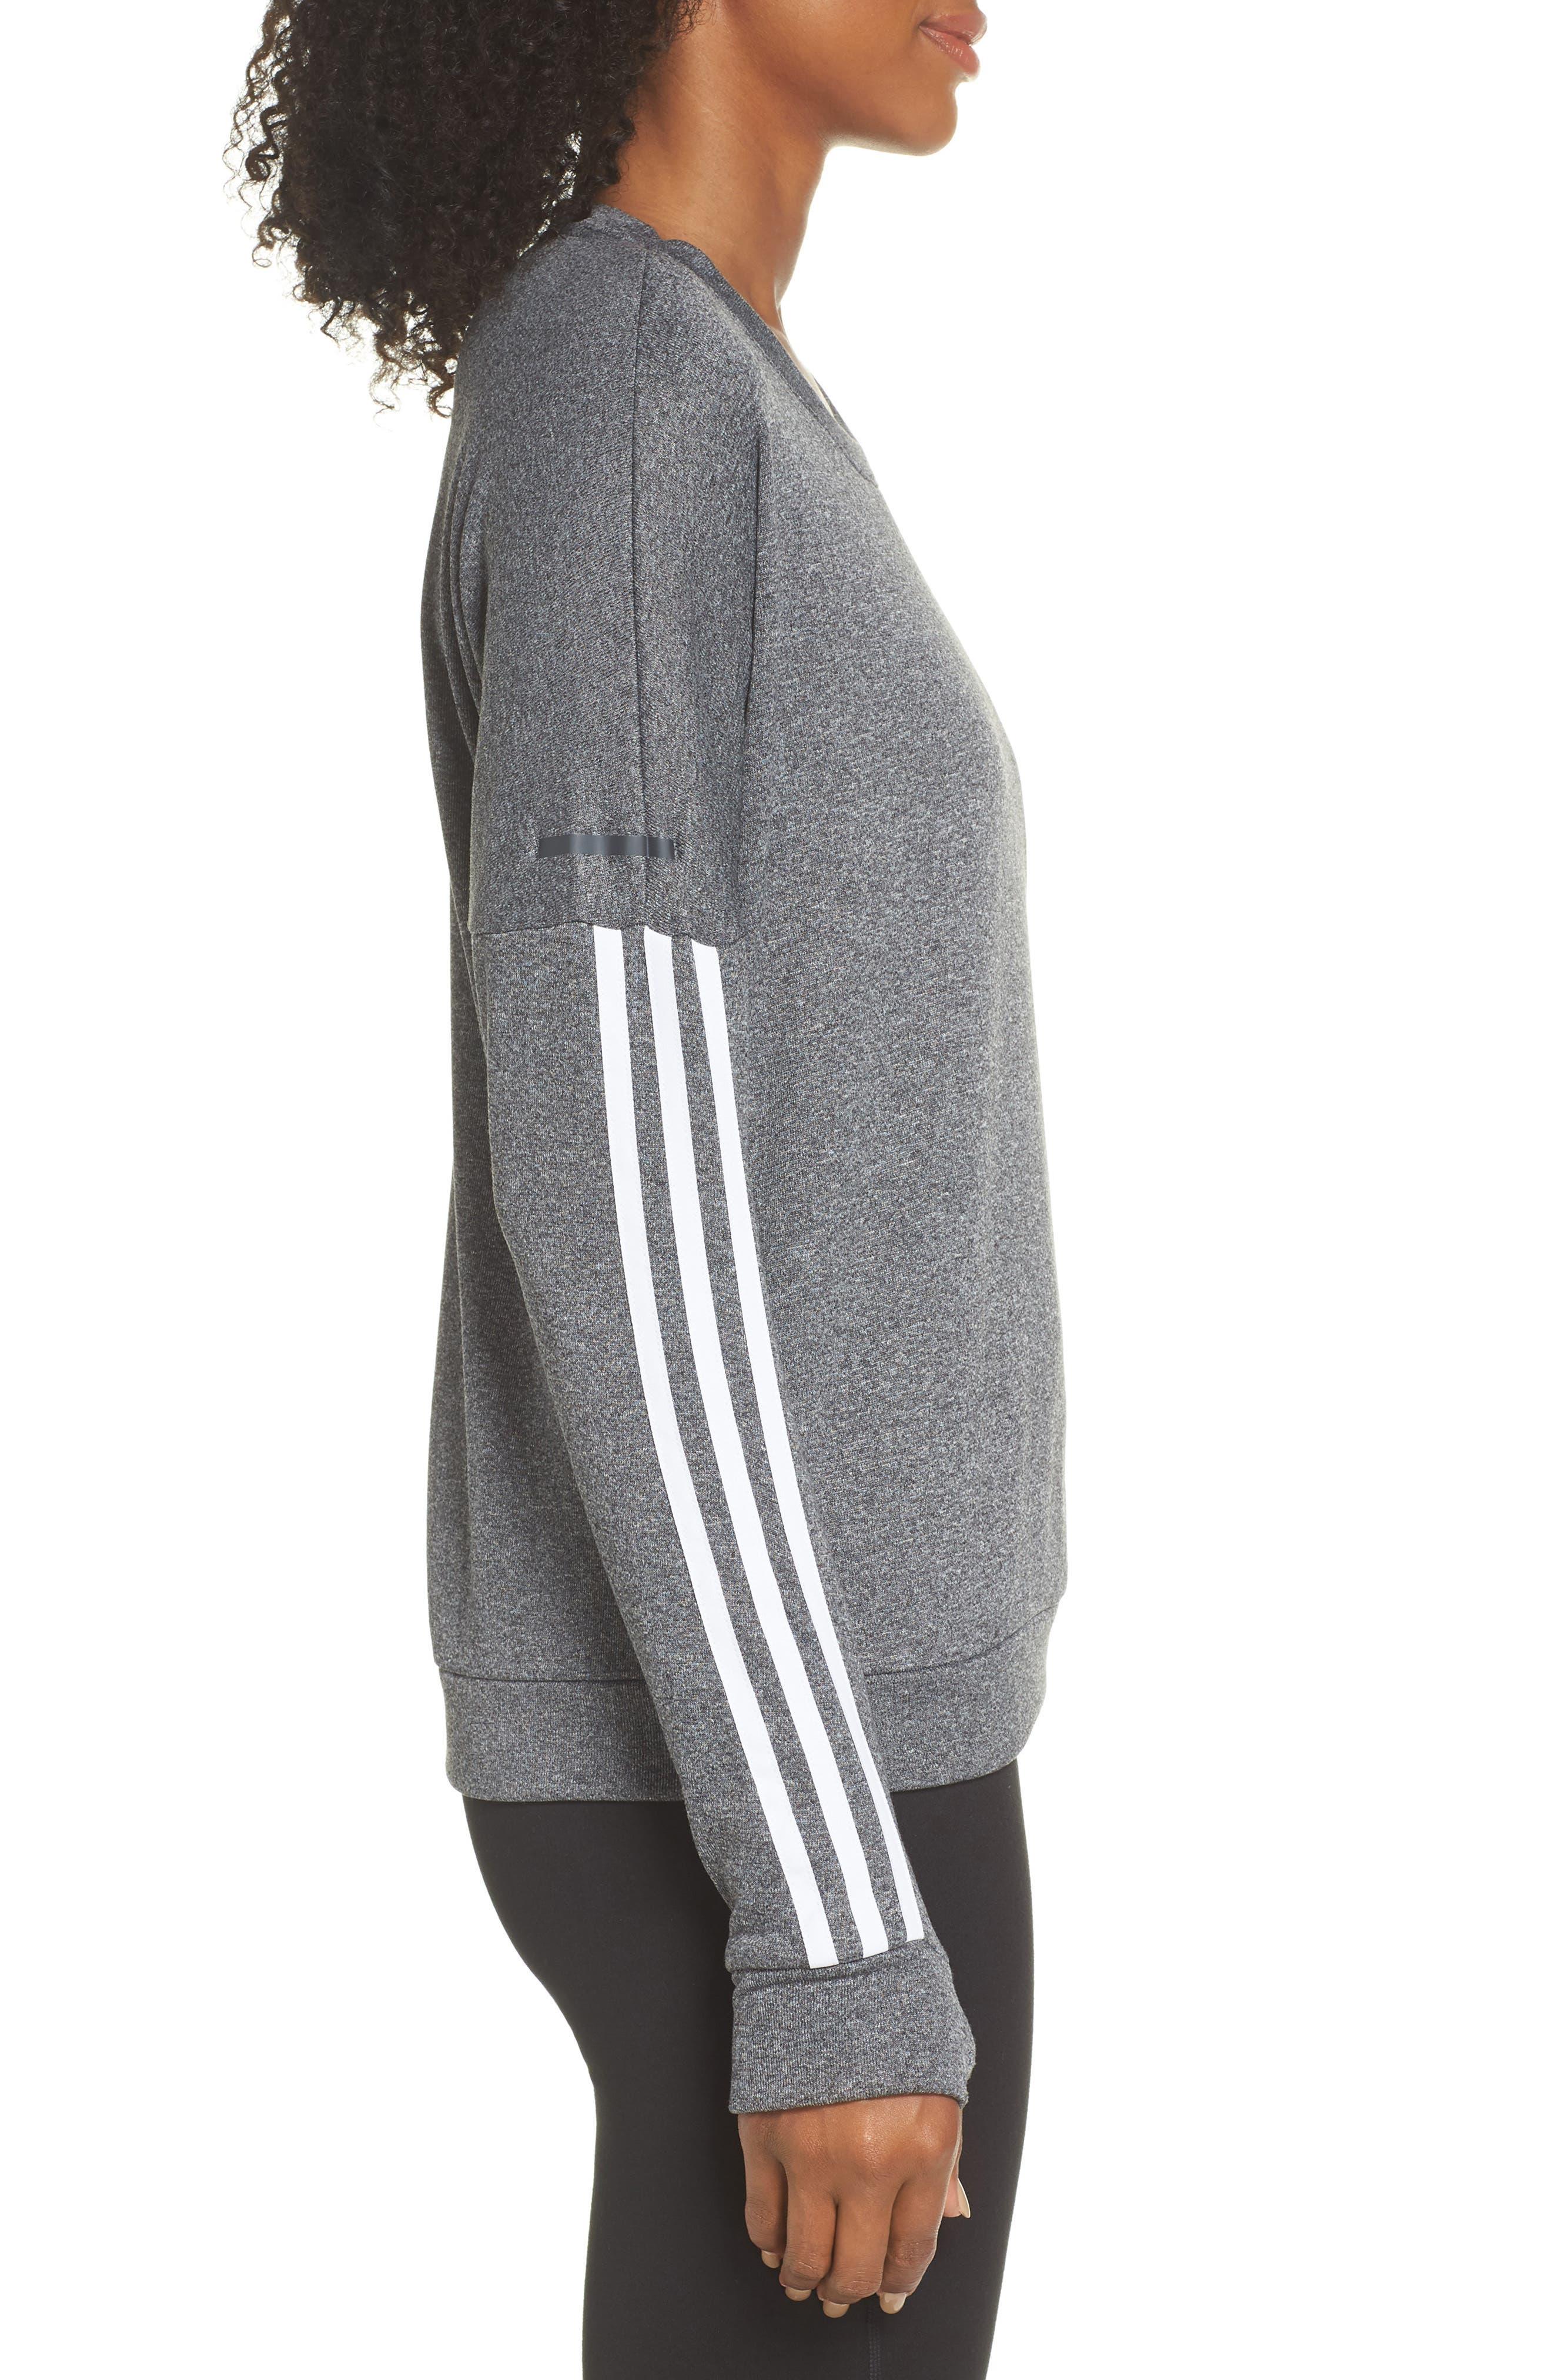 3-Stripes Running Sweatshirt,                             Alternate thumbnail 3, color,                             DARK GREY HEATHER